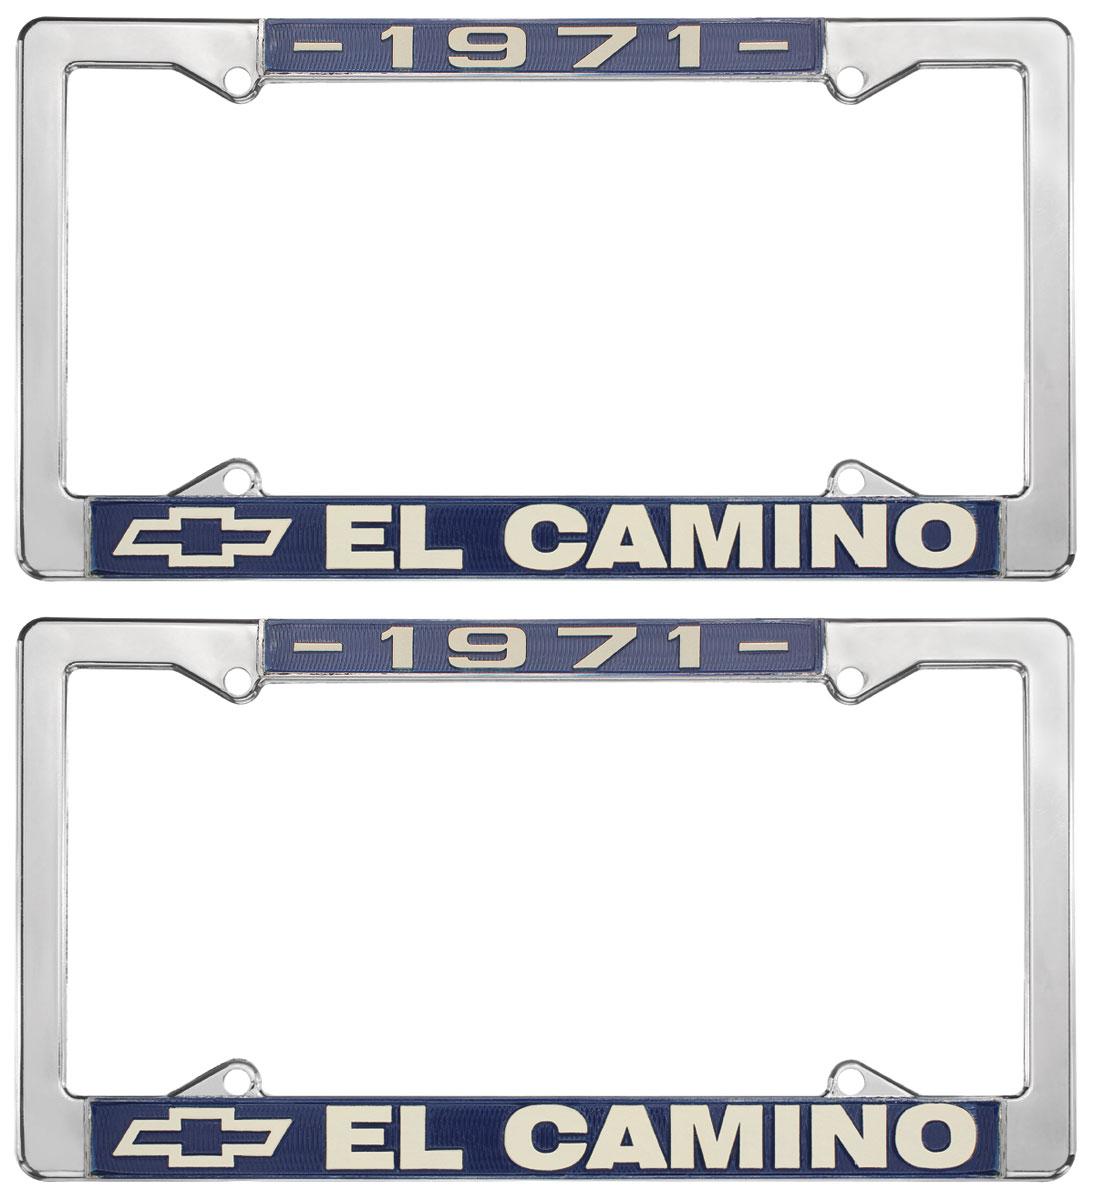 Photo of License Plate Frames, El Camino Custom